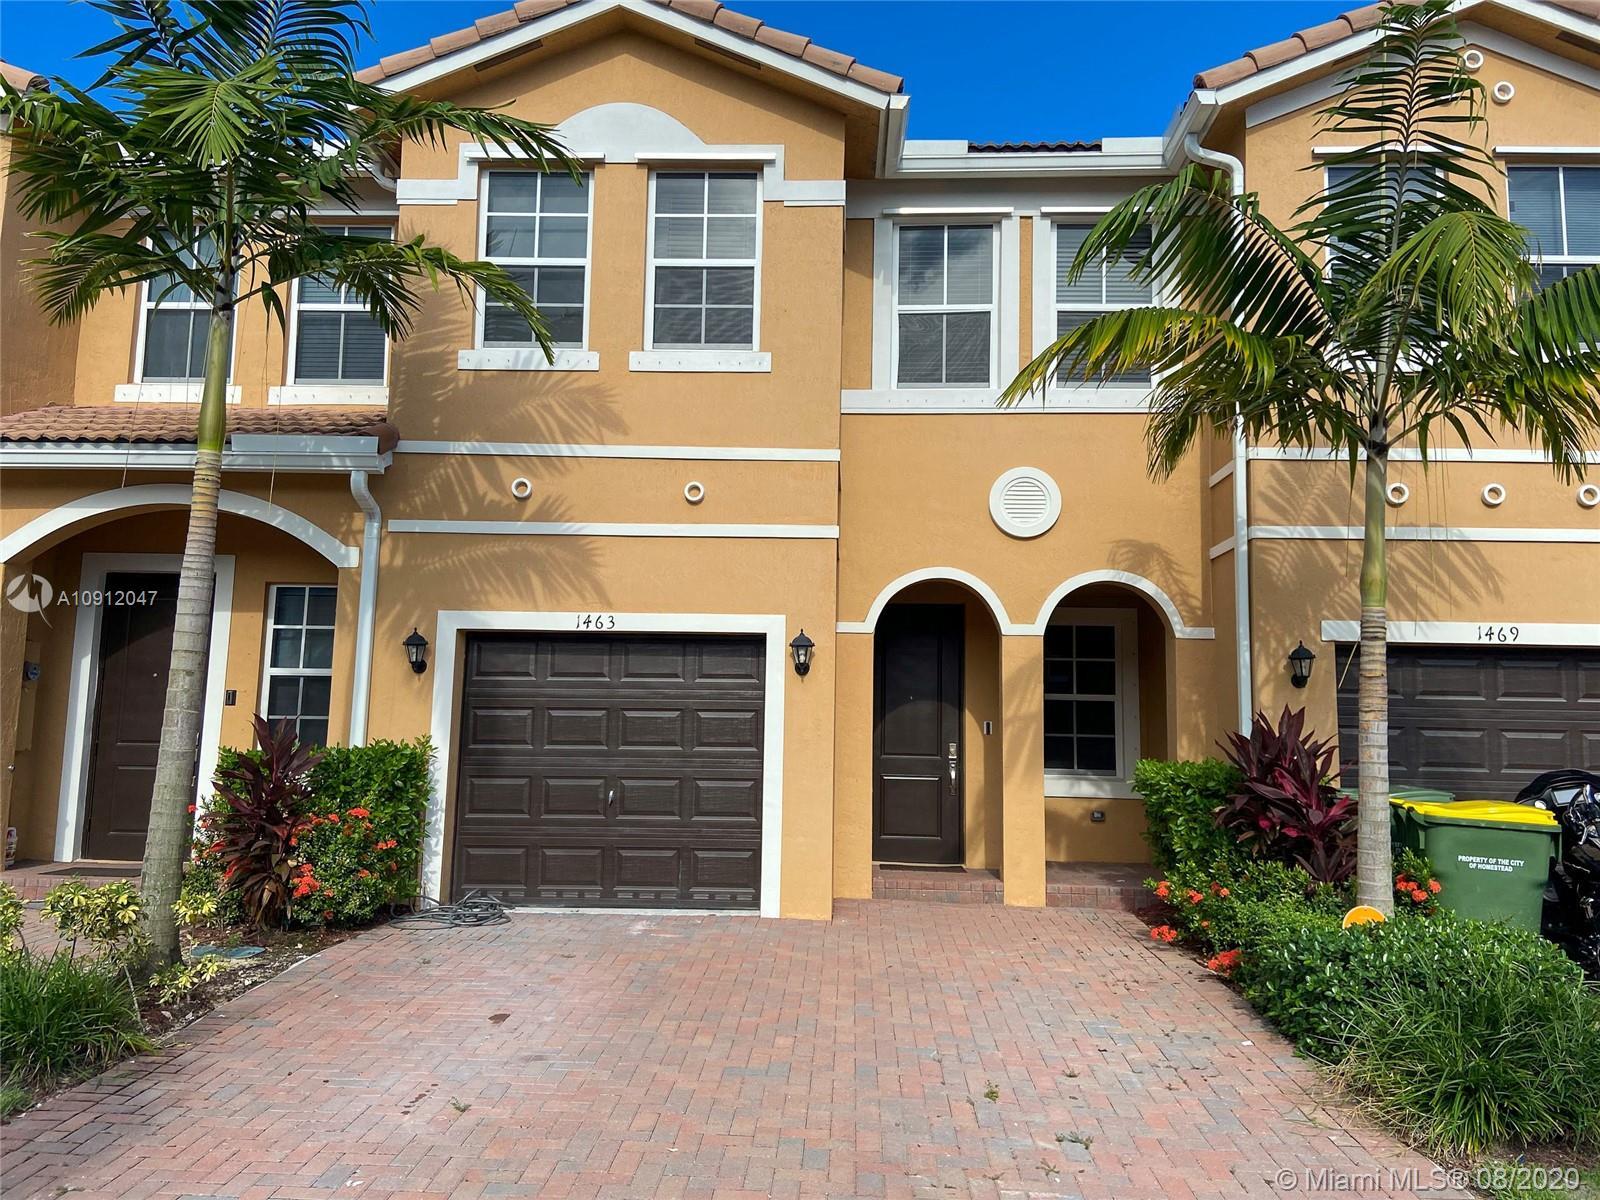 1463 SE 24th Ter Property Photo